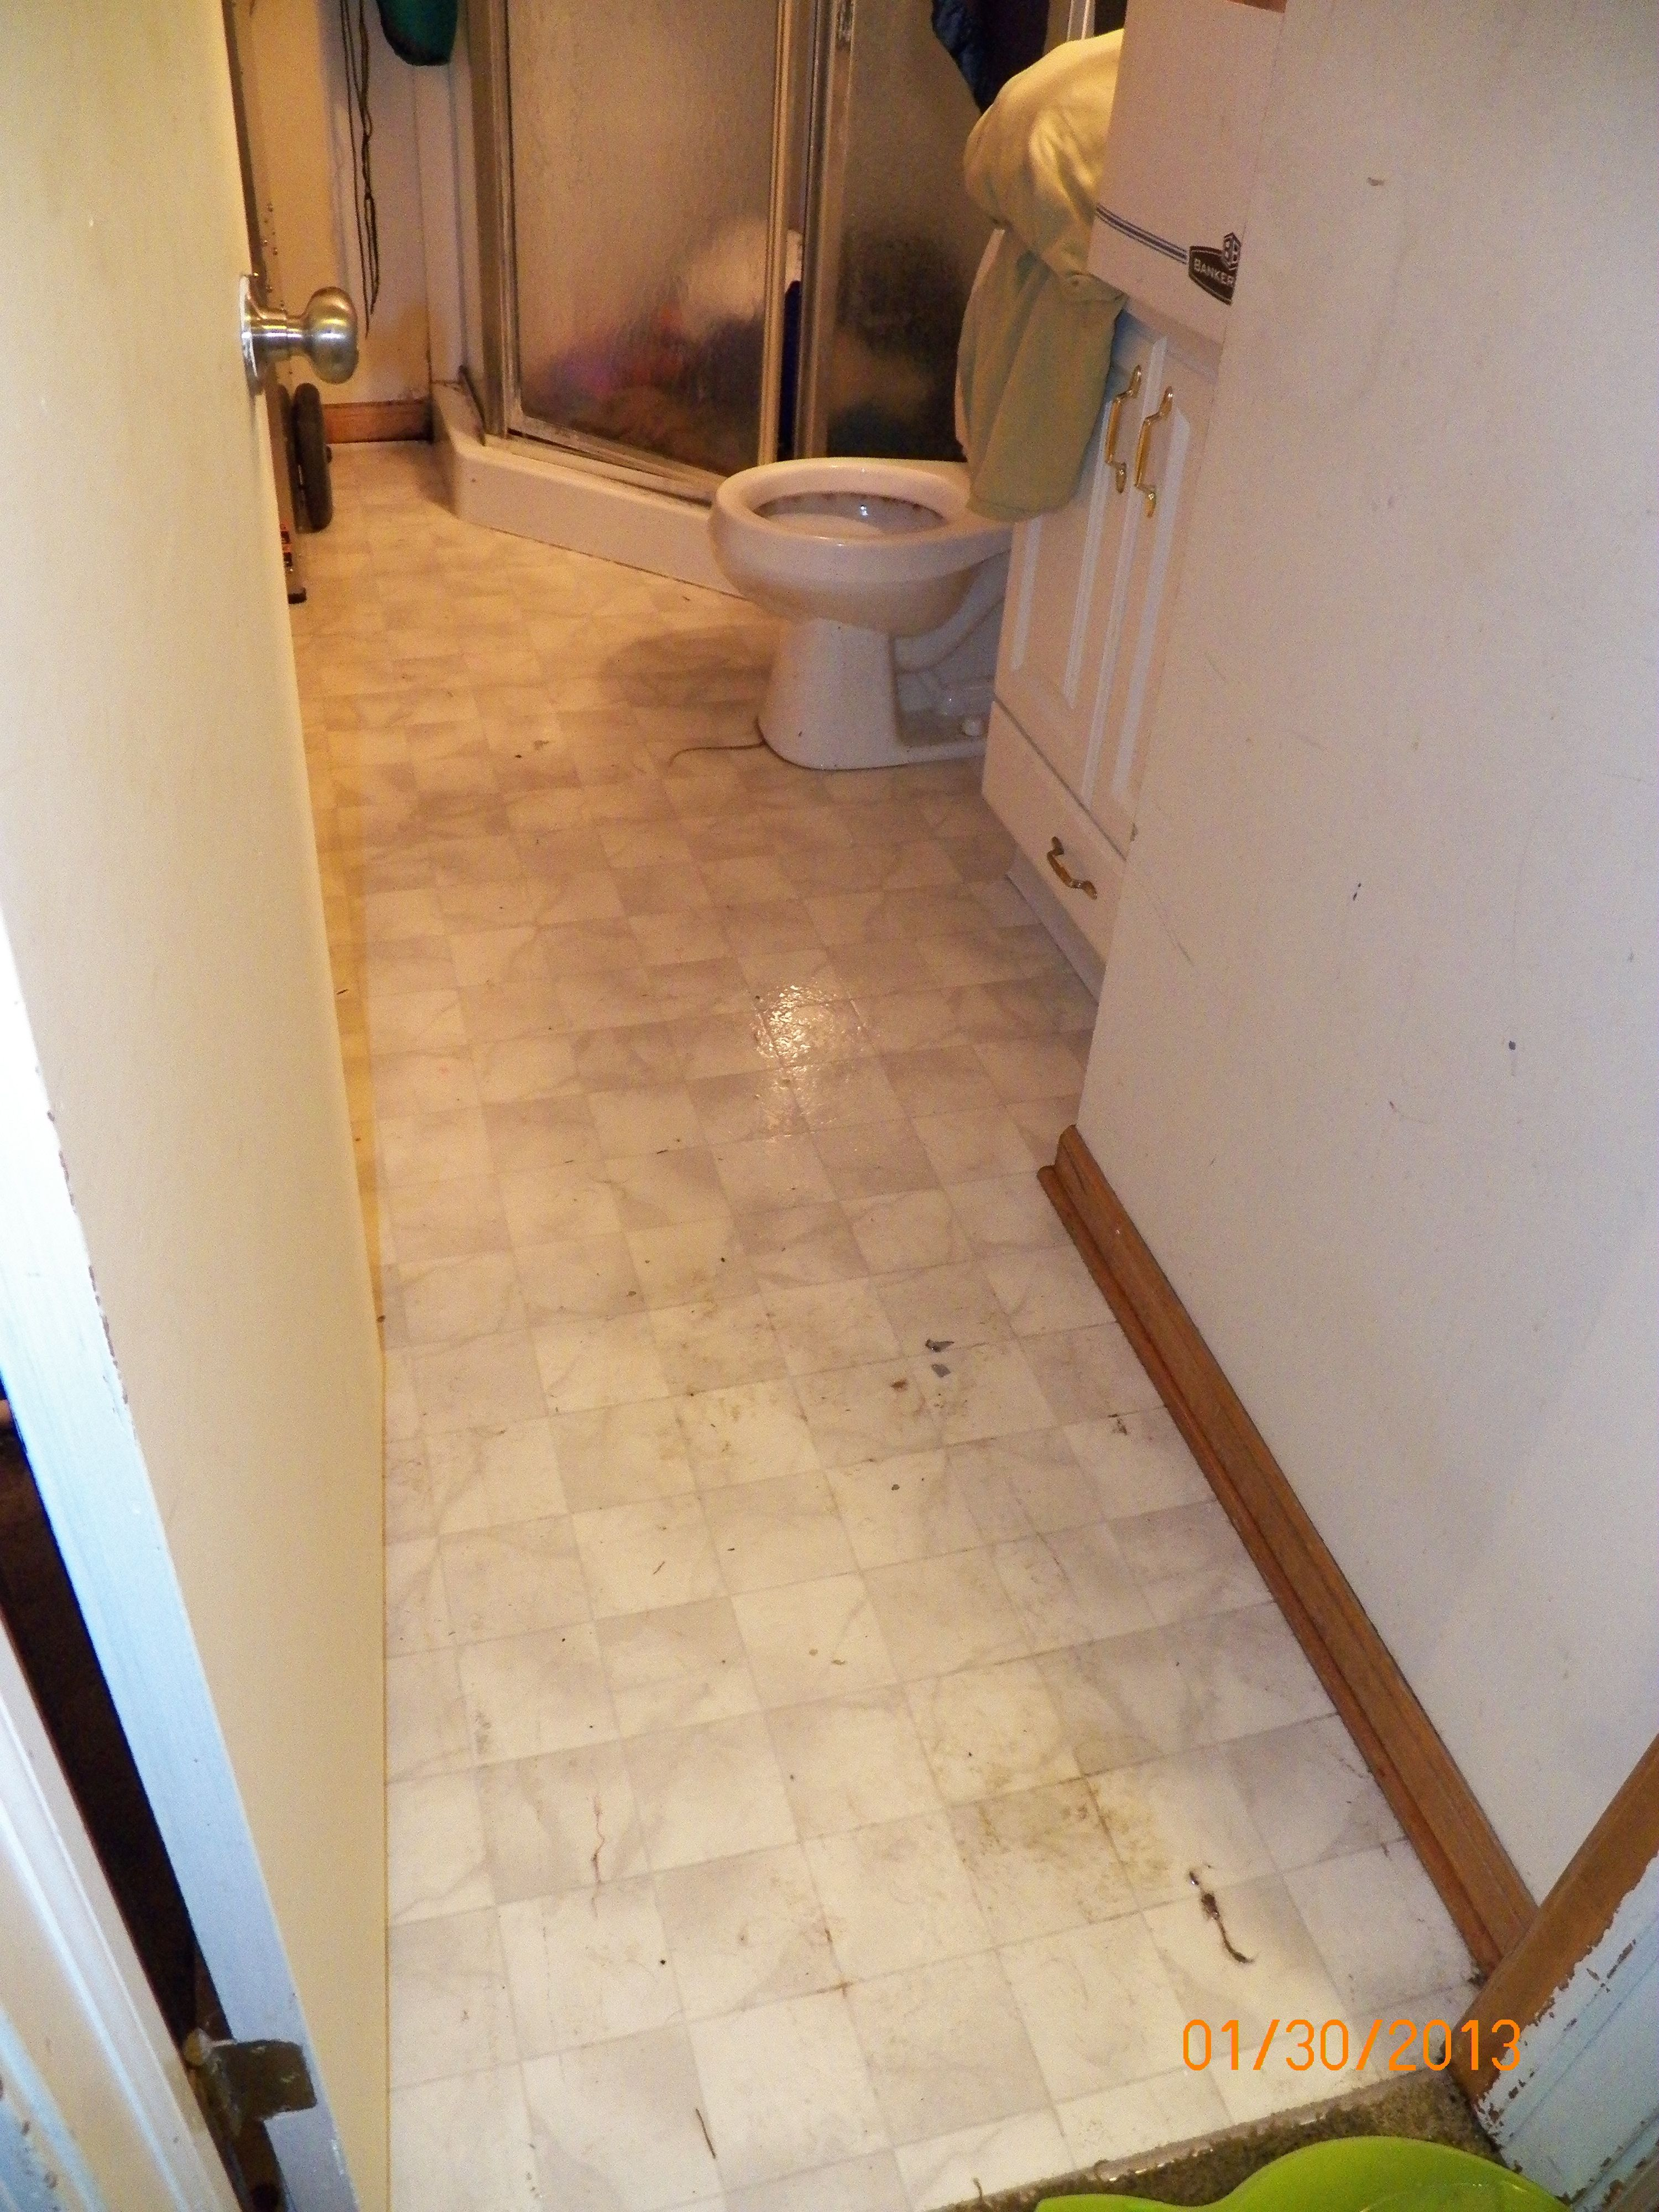 Flooded water from toilet leak. Leaking toilet, Water